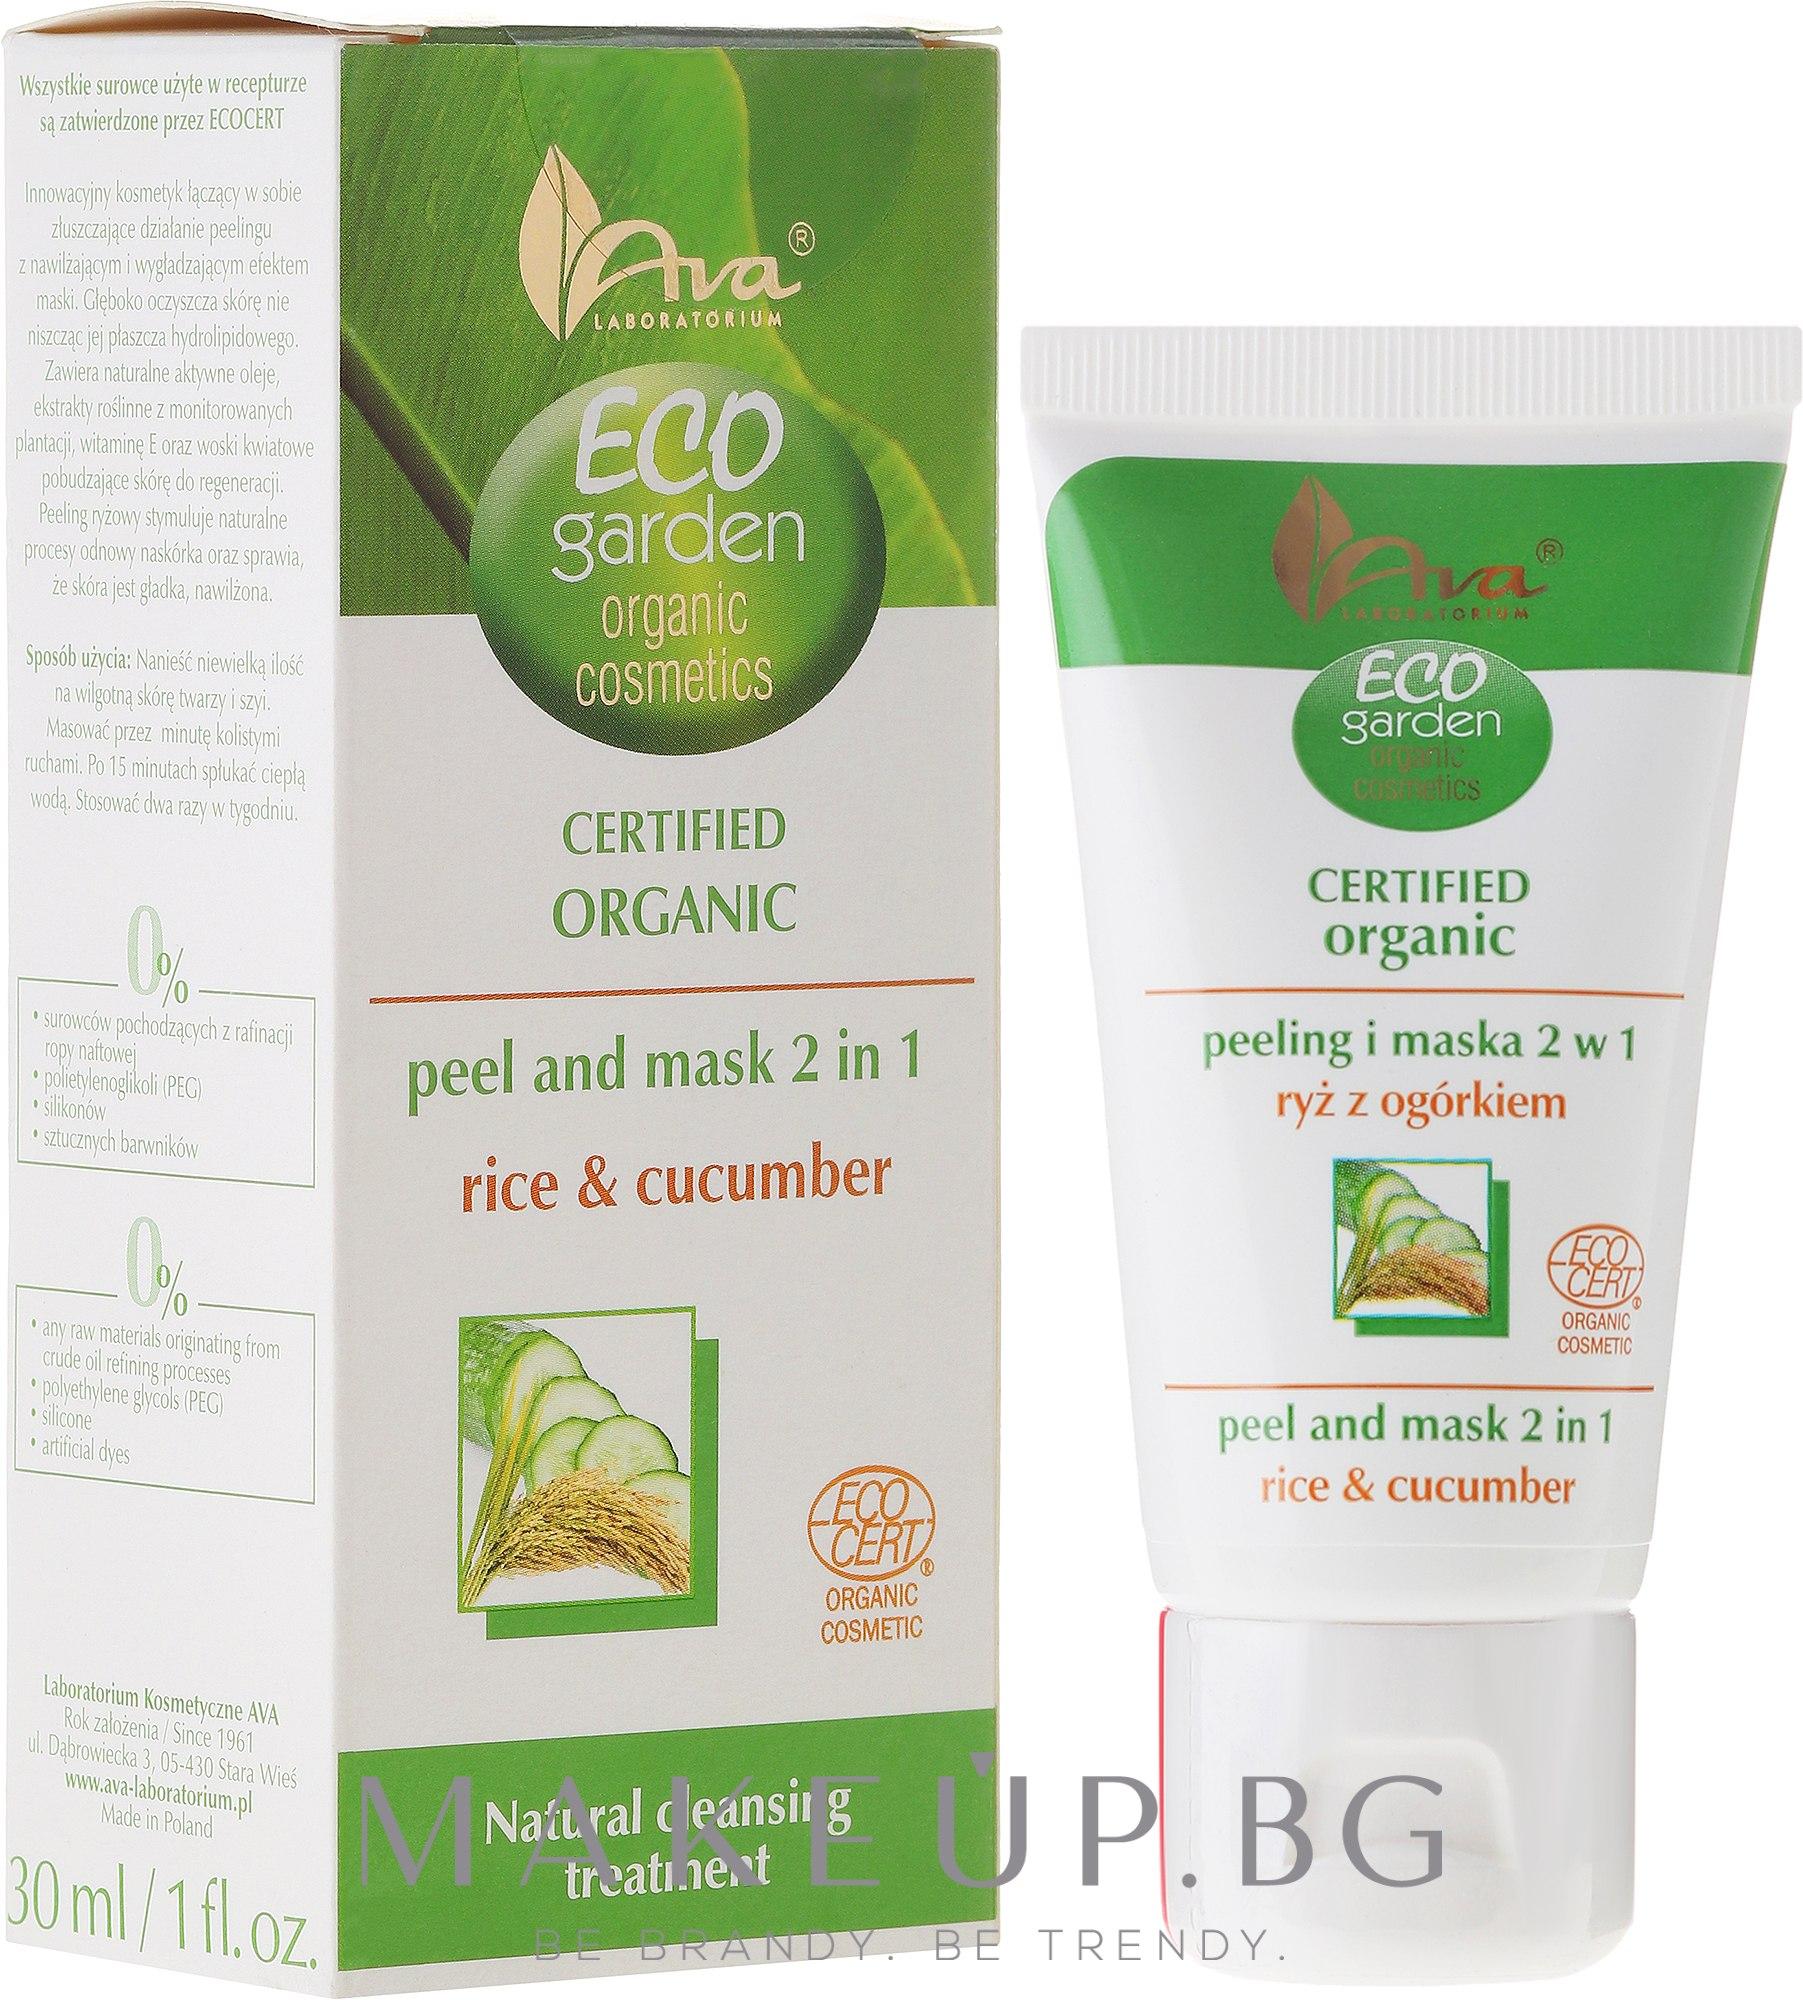 Пилинг-маска за лице с екстракт от ориз и краставица - Ava Laboratorium Eco Garden Certified Organic Peeling & Mask Rice & Cucumber — снимка 30 ml